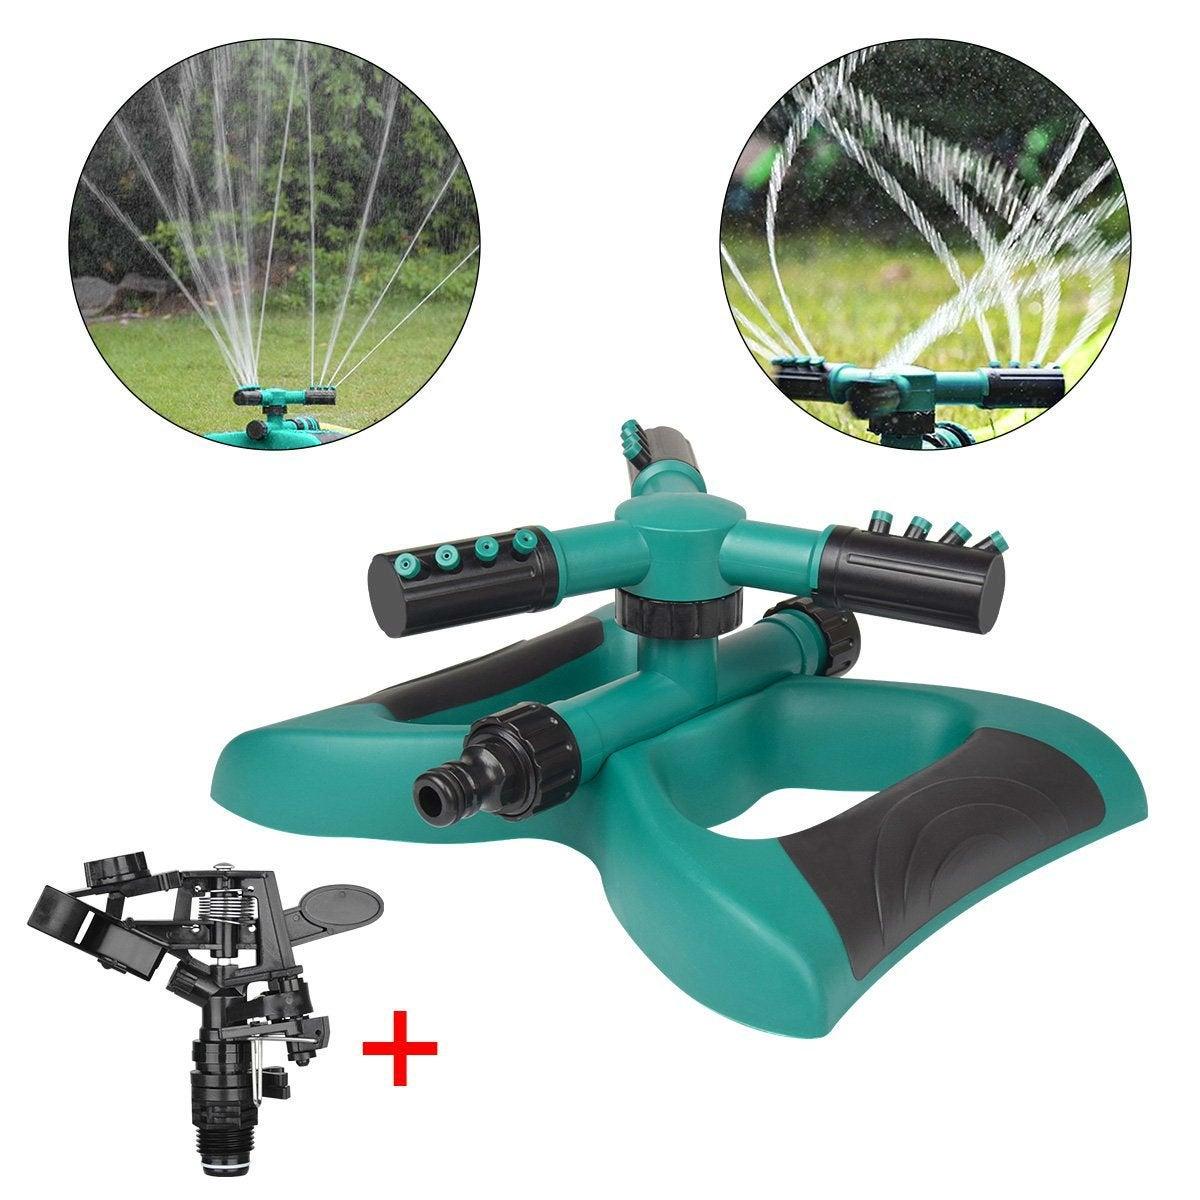 Best Lawn Sprinkler for Customizable Coverage: TZCER Dual-Head Rotating Sprinkler